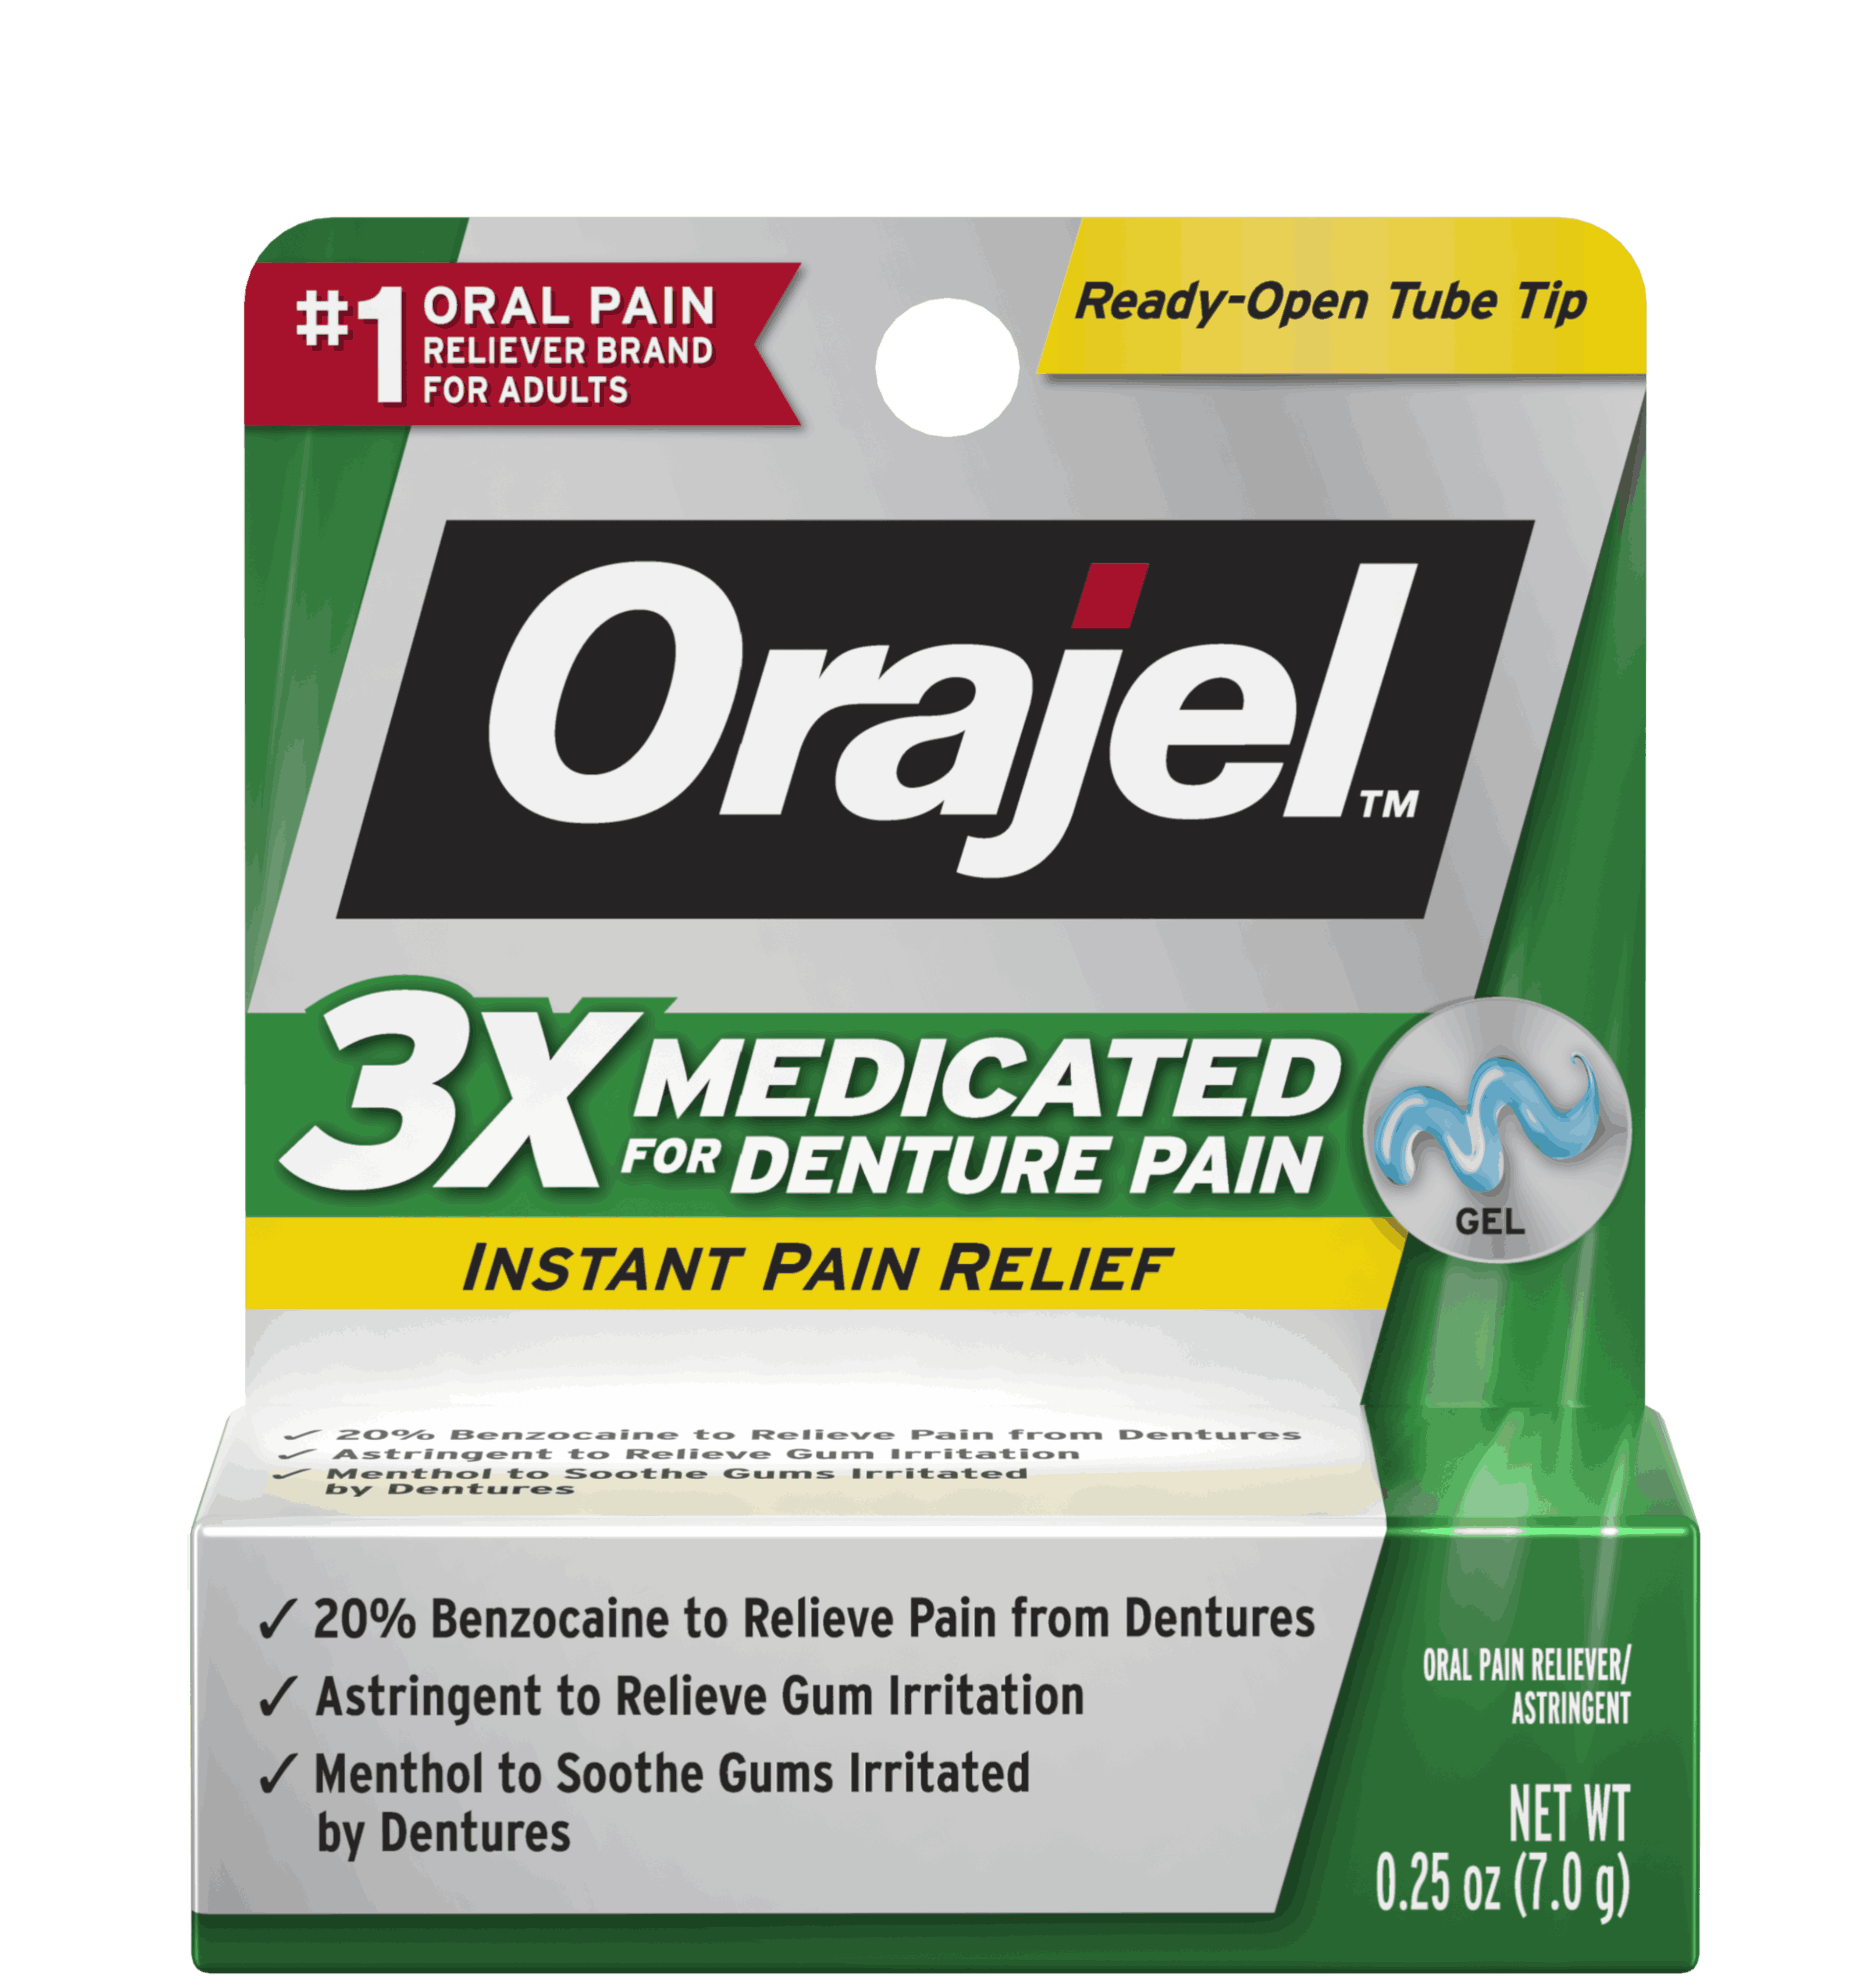 3x Medicated For Denture Pain Gel Orajel